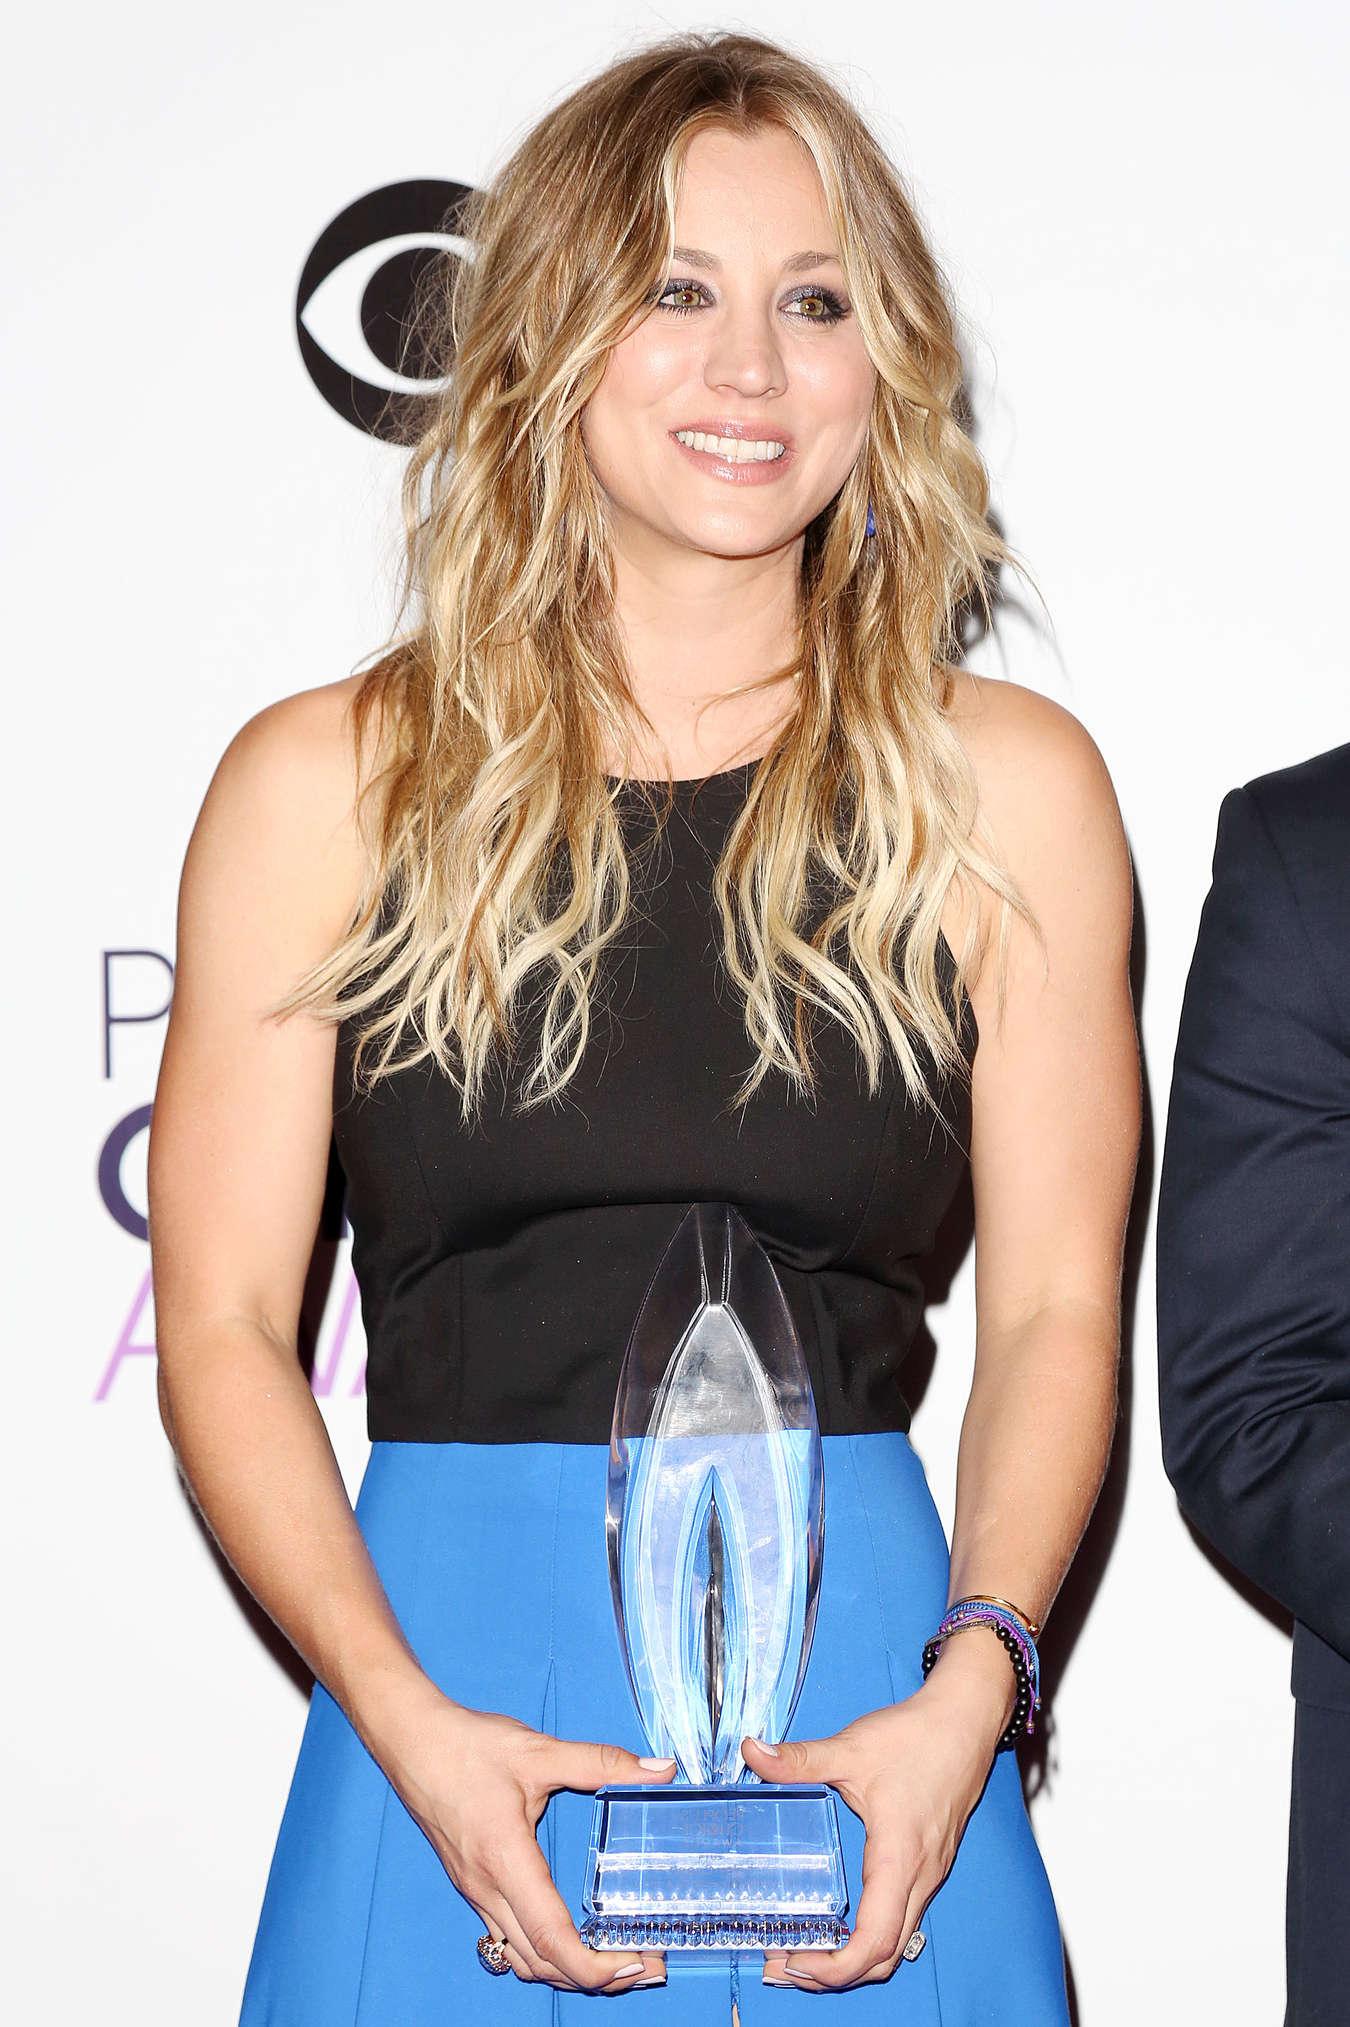 Kaley Cuoco 2014 : Kaley Cuoco Photos: 2014 PCA Peoples Choice Awards -09